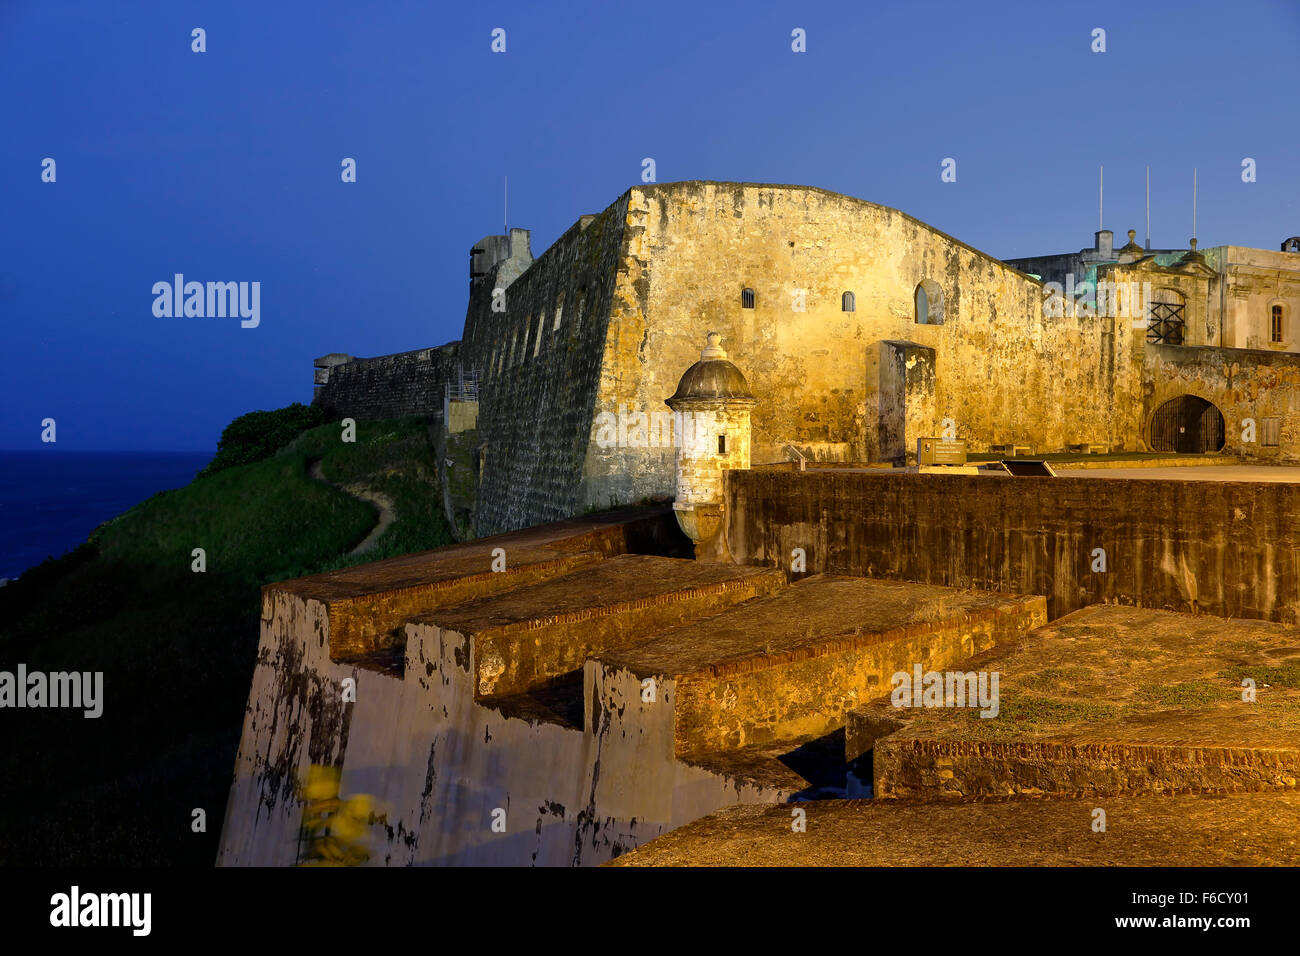 San Cristobal Castle, San Juan National Historic Site, Old San Juan, Puerto Rico - Stock Image